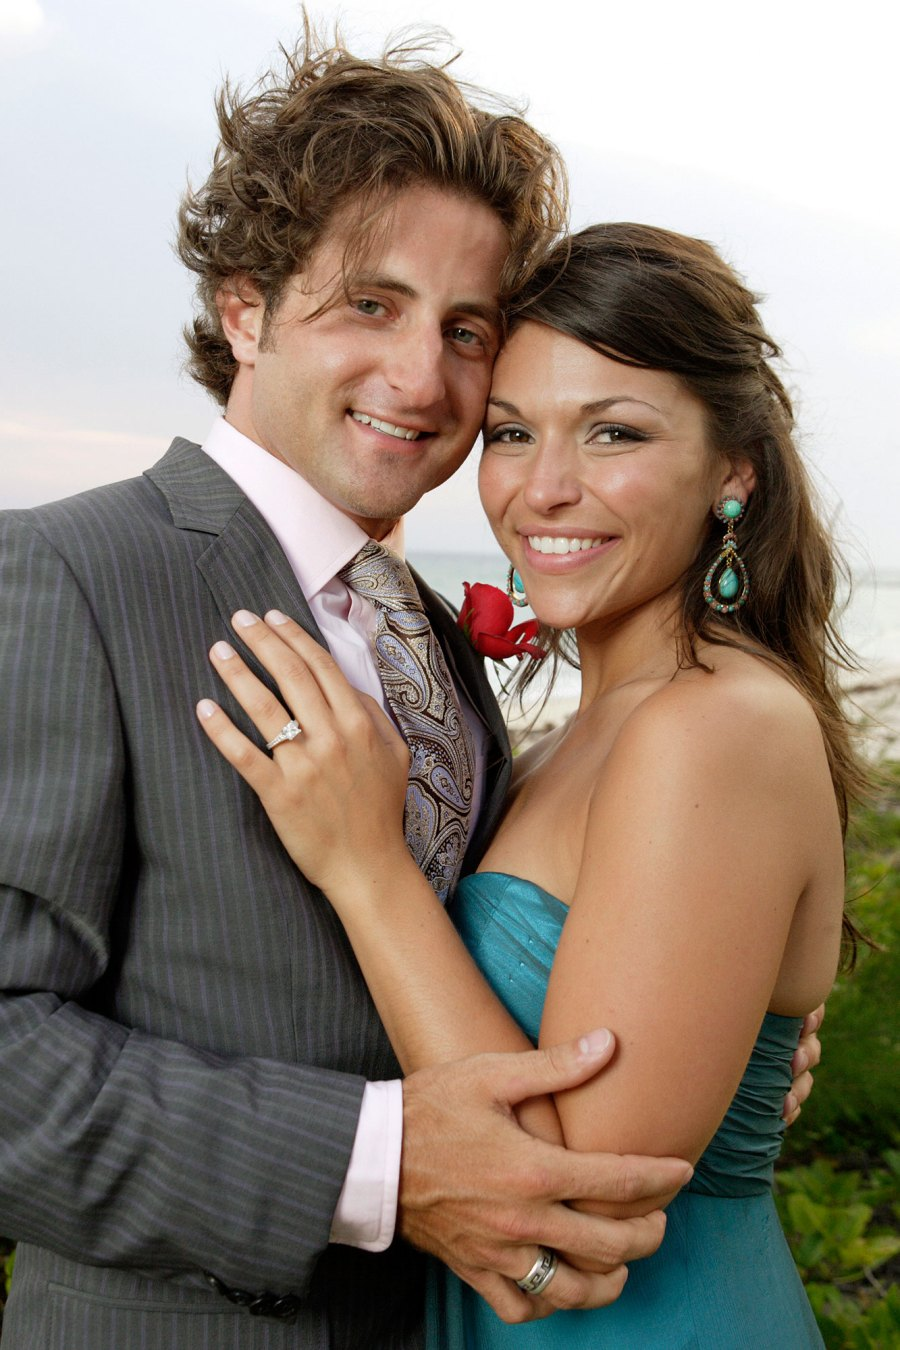 DeAnna Pappas and Jesse Csincsak Every Time the 1st Impression Rose Recipient Won The Bachelor or The Bachelorette